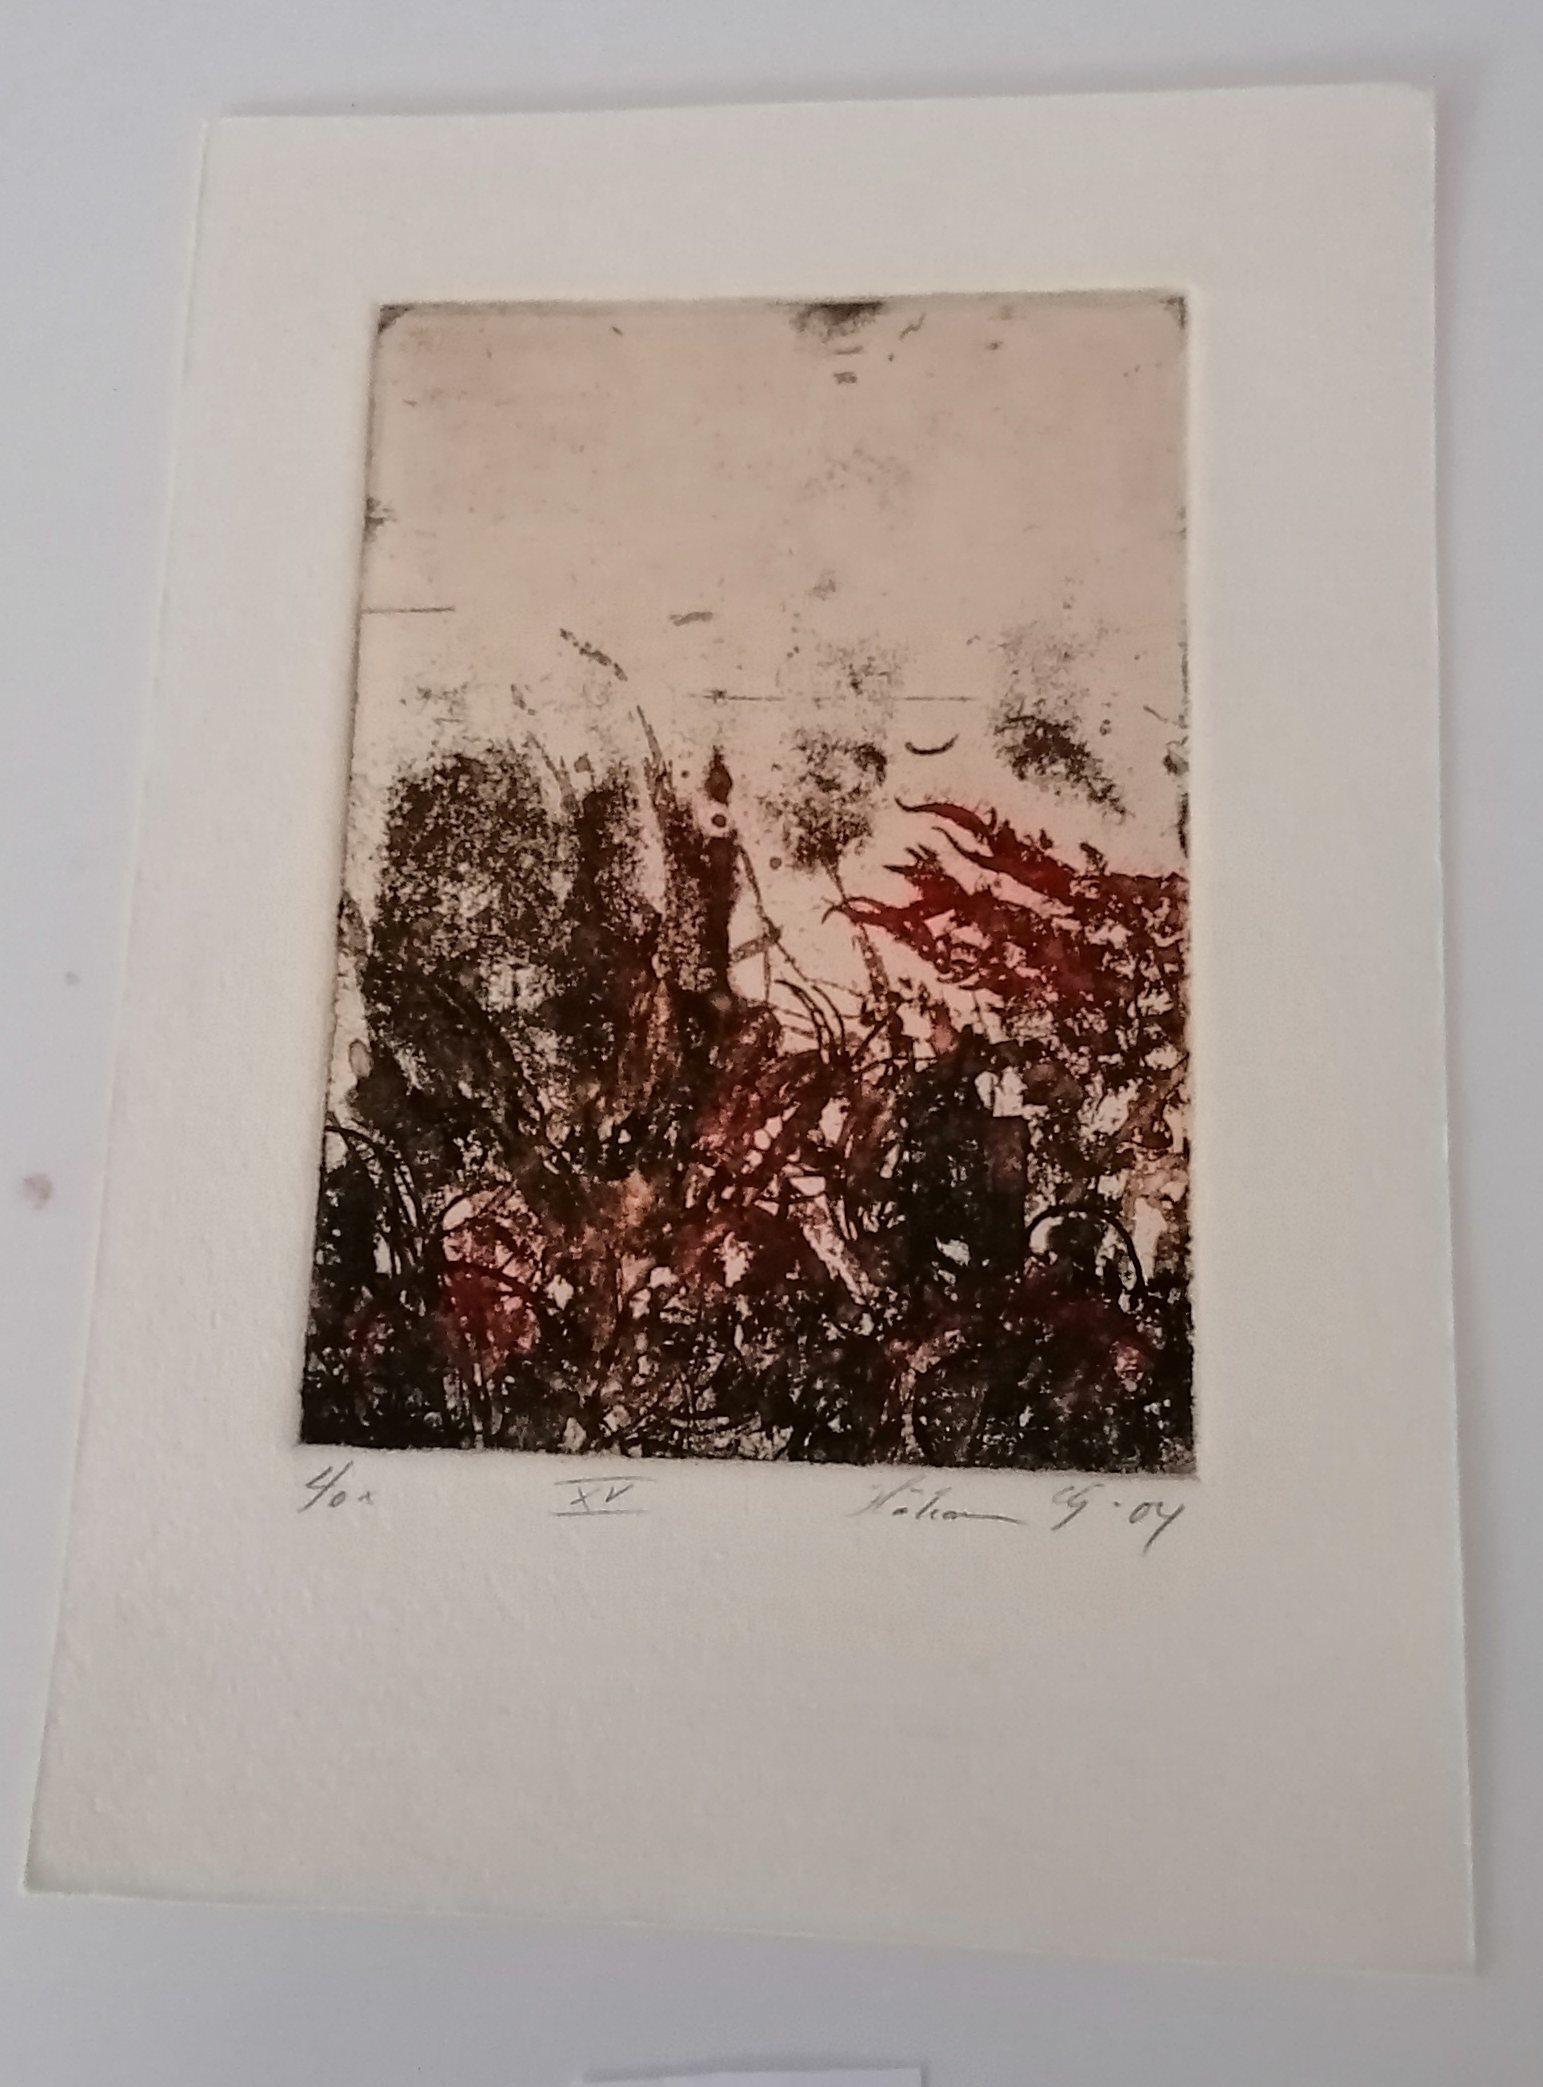 https://www.norstamps.com/content/images/stamps/gtgallerier/195.jpg